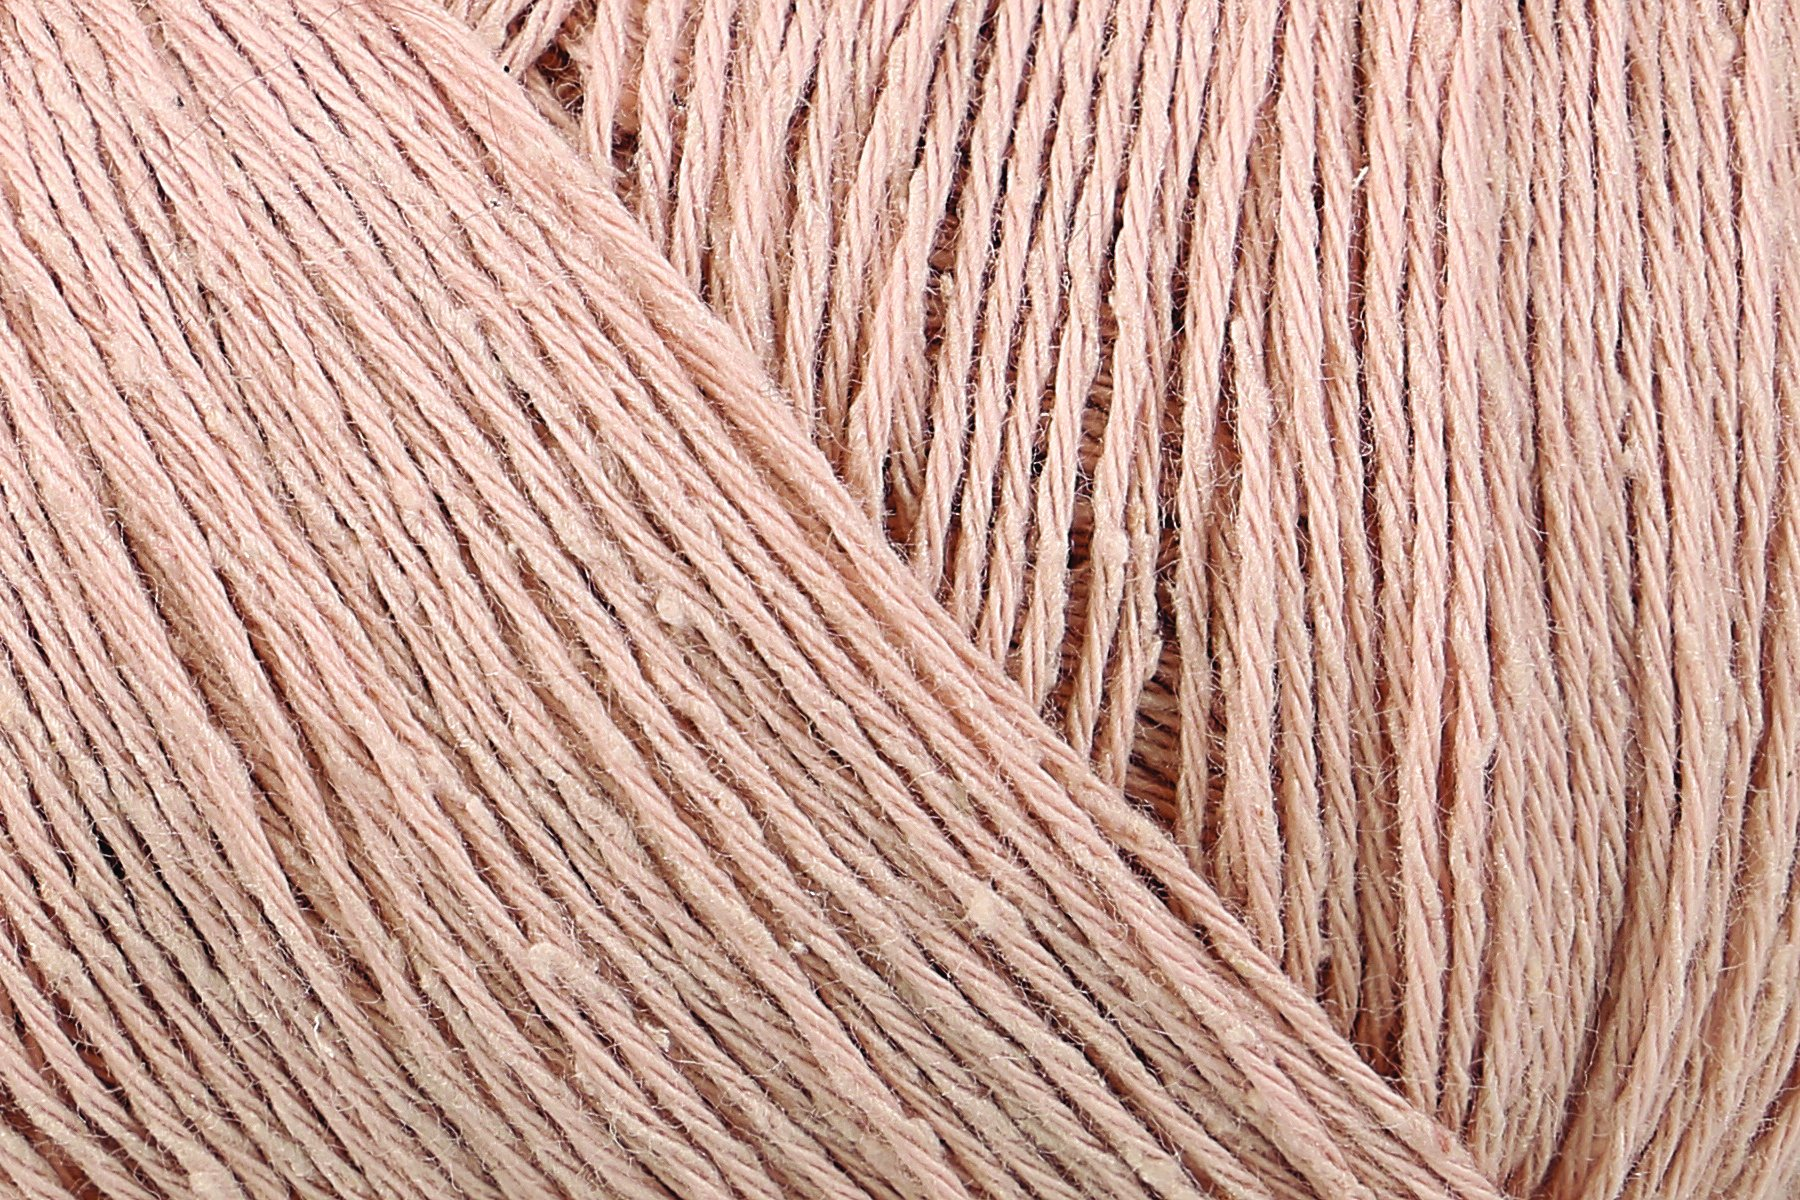 Silky Lace yarn by Rowan